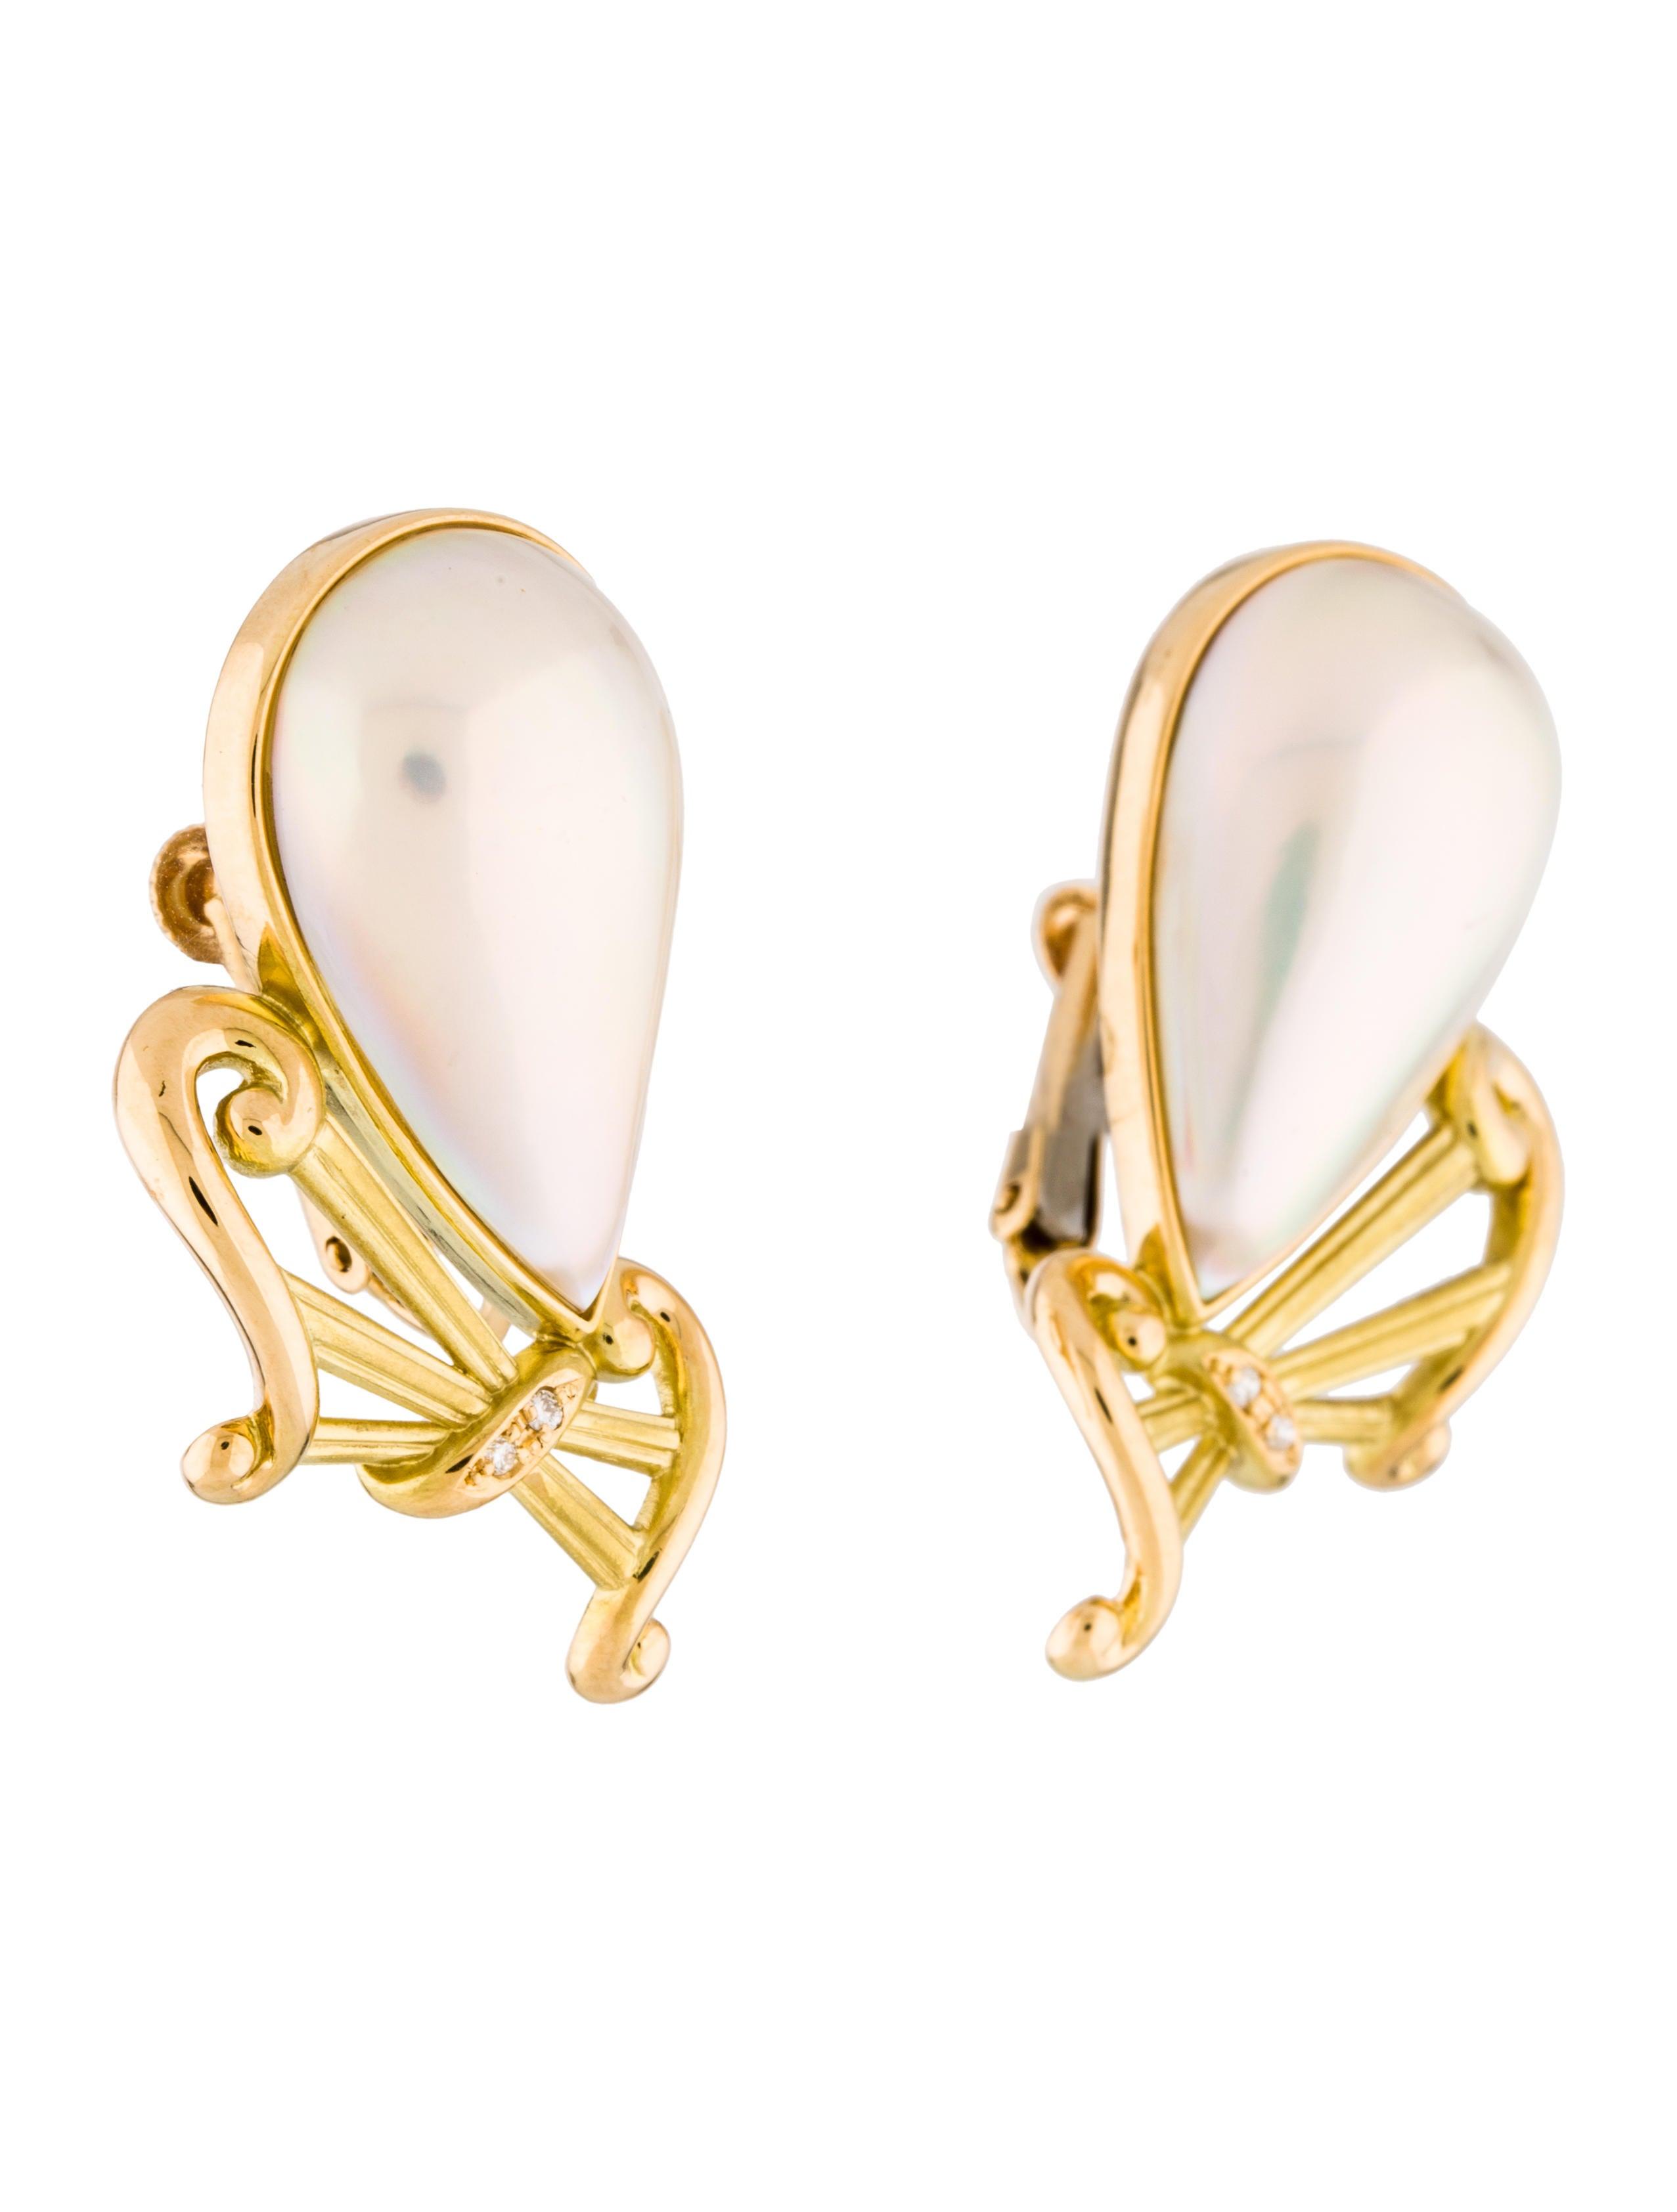 18k mab pearl diamond clip on earrings earrings. Black Bedroom Furniture Sets. Home Design Ideas